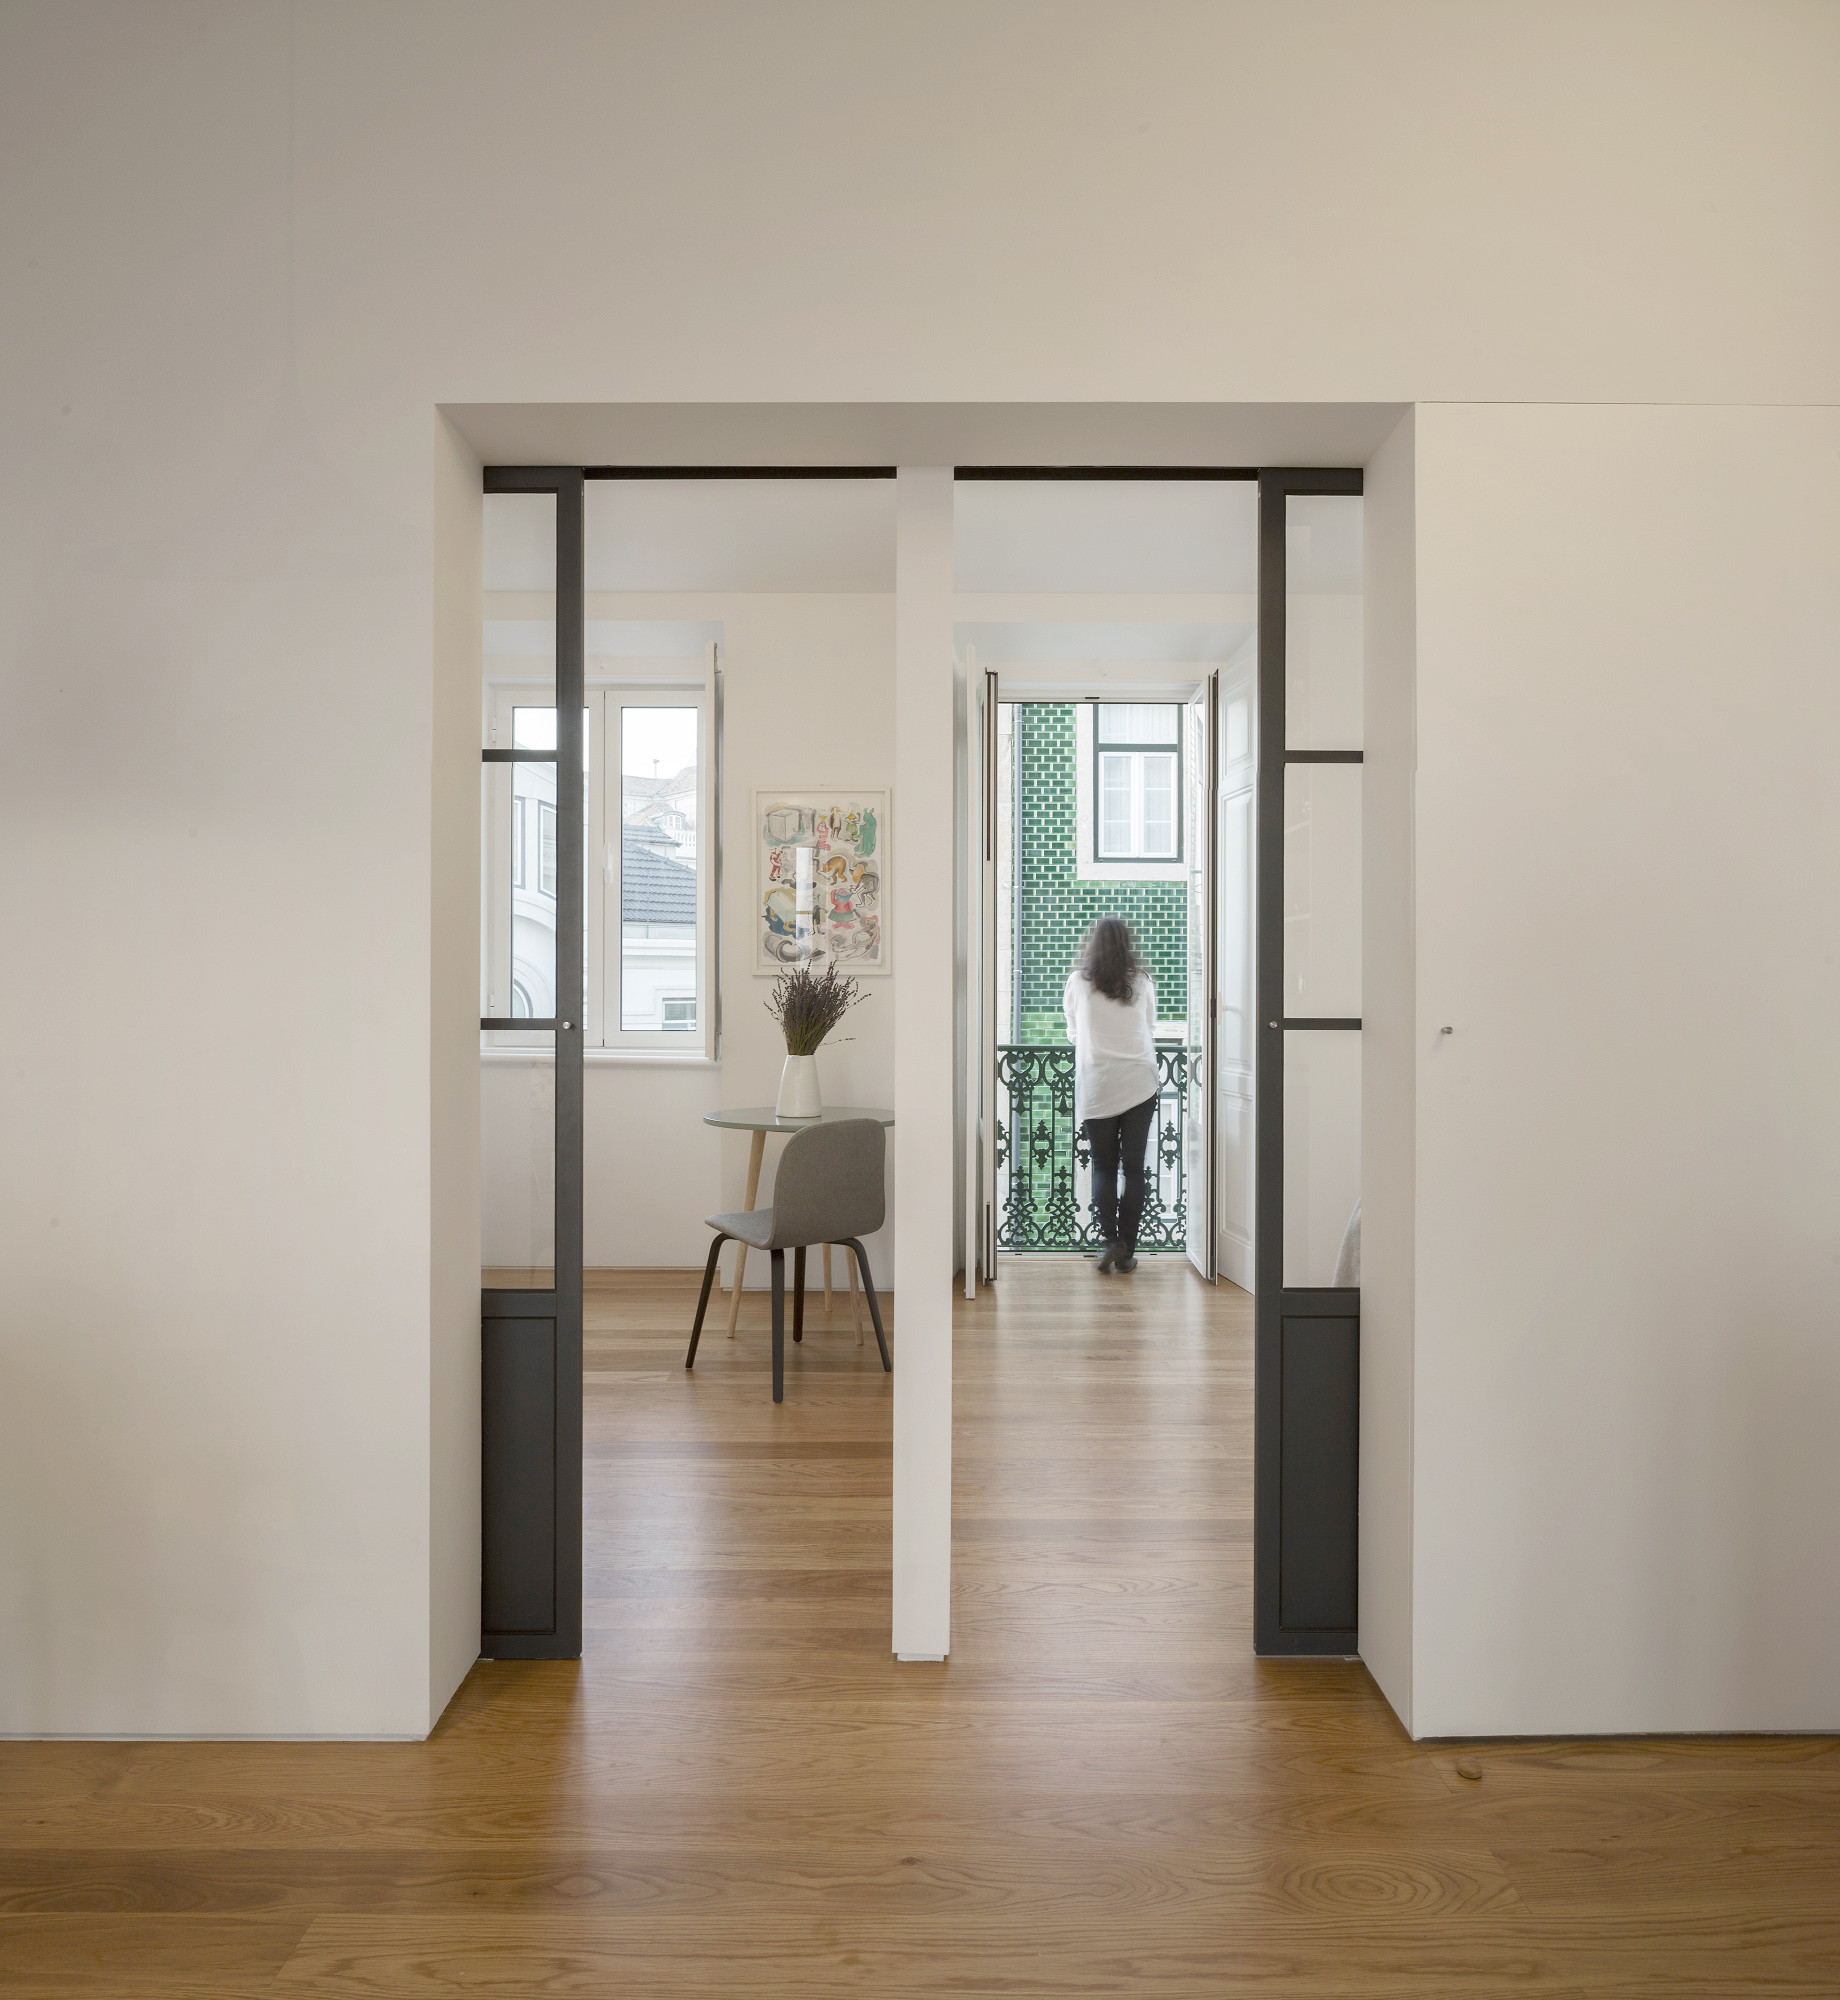 Príncipe Real Apartment / fala atelier, © Fernando Guerra | FG+SG